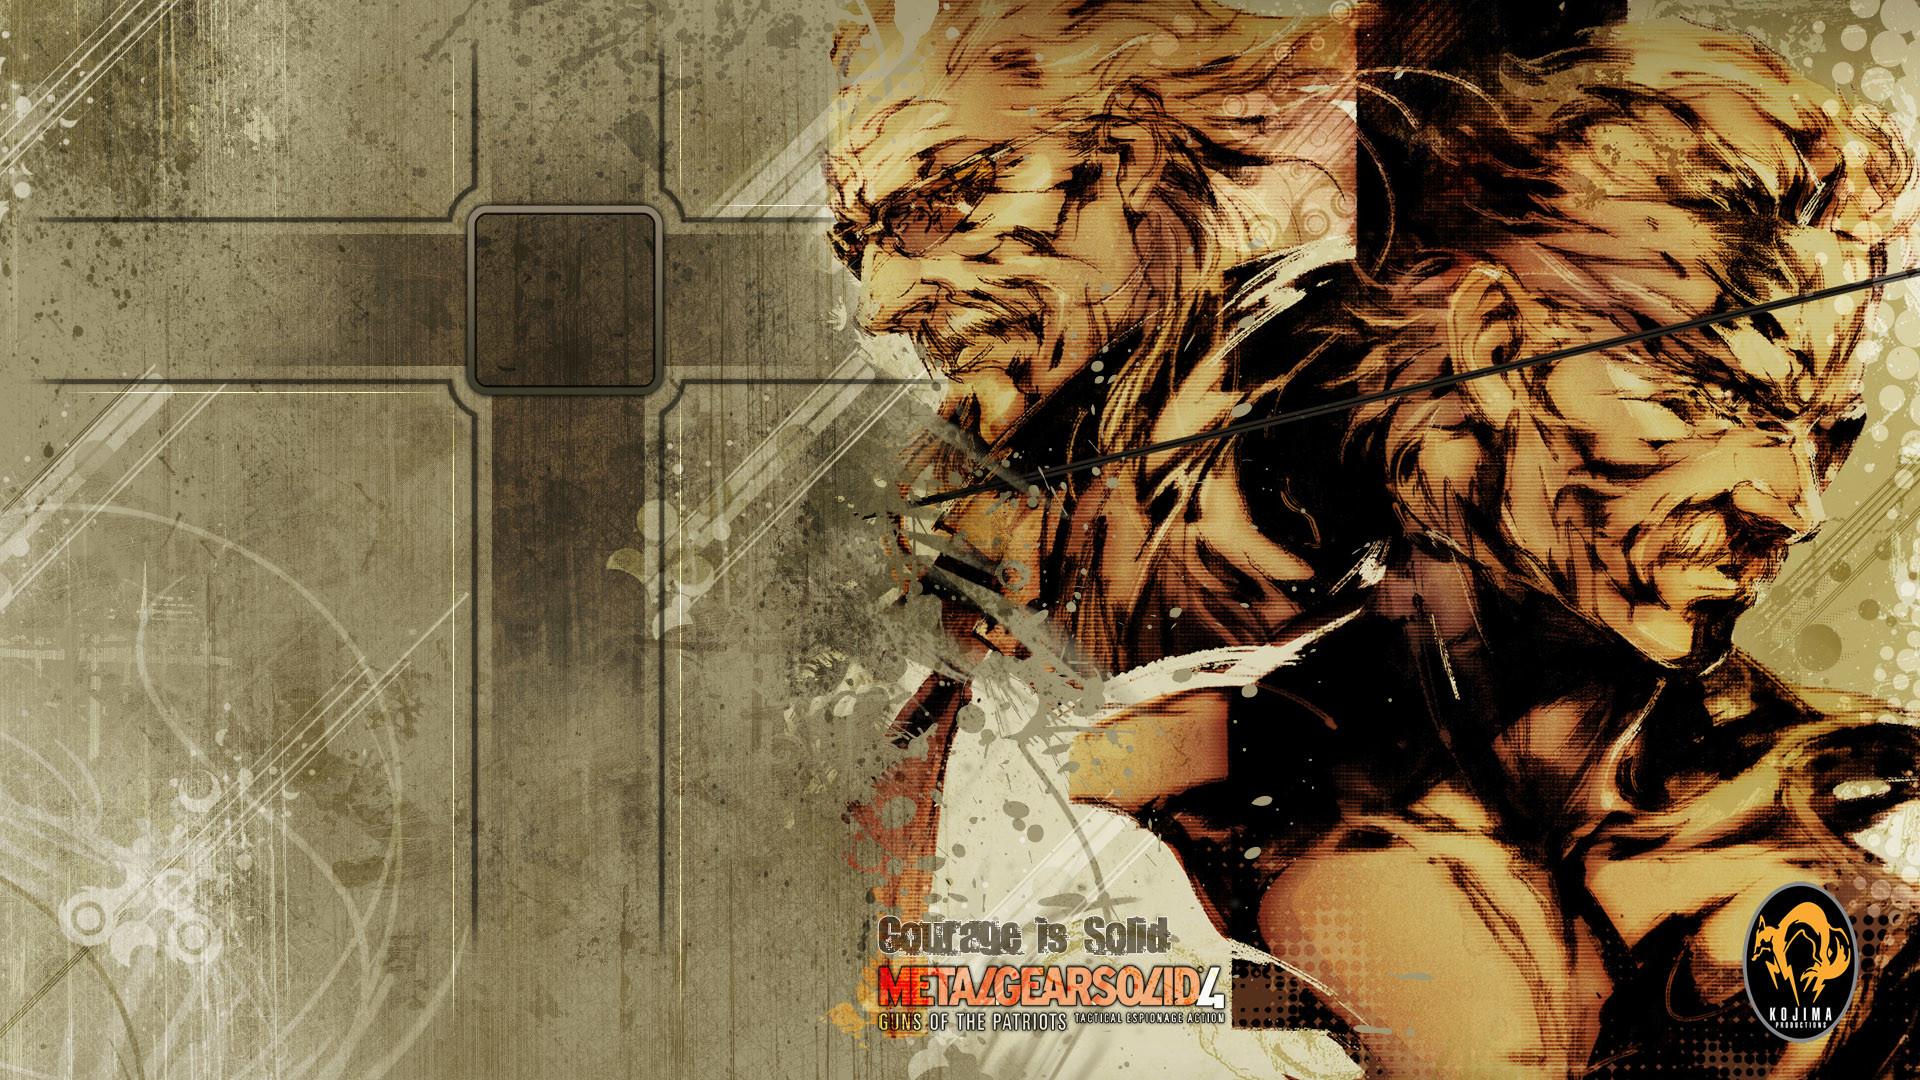 Metal Gear Solid 4 Wallpapers (64 Wallpapers)